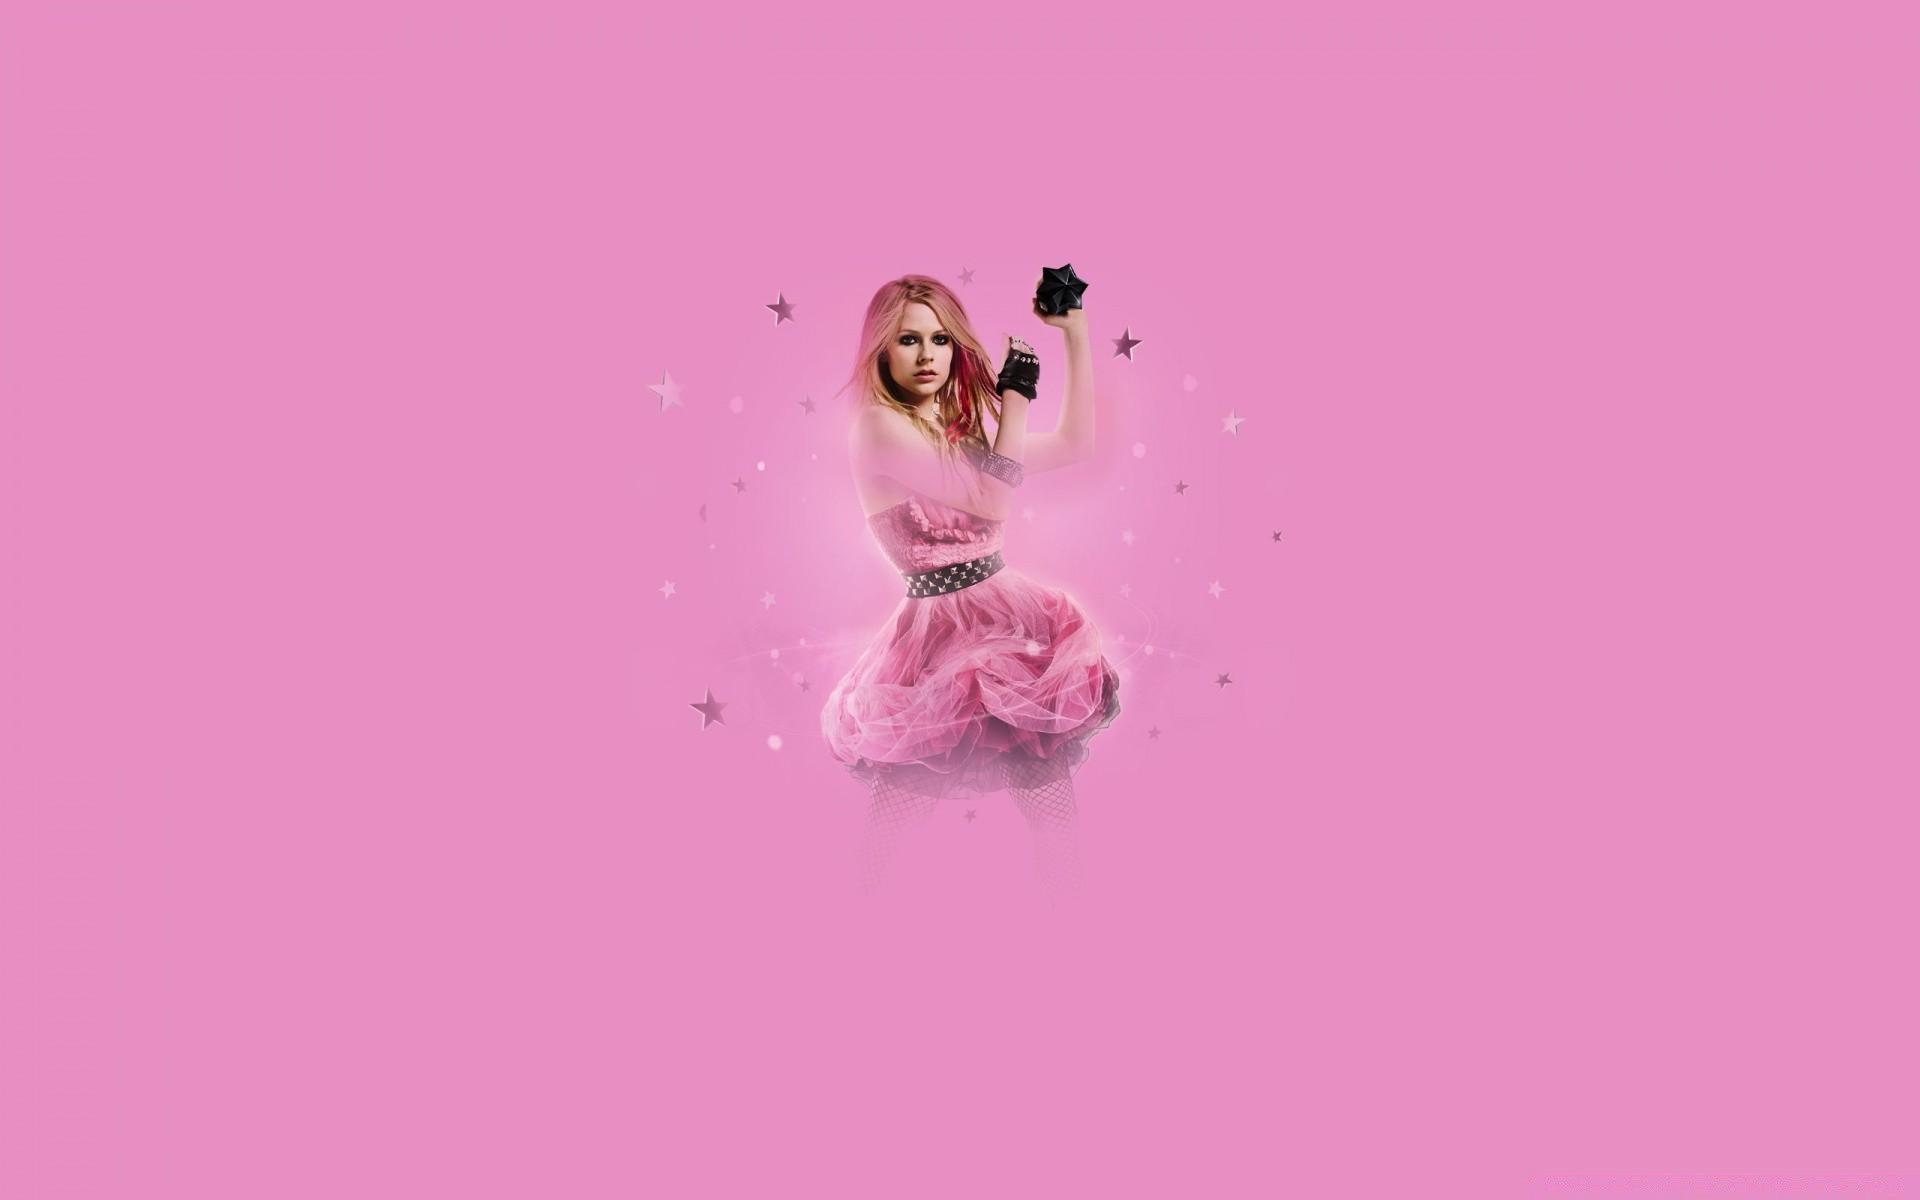 Avril Lavigne Black Star Phone Wallpapers